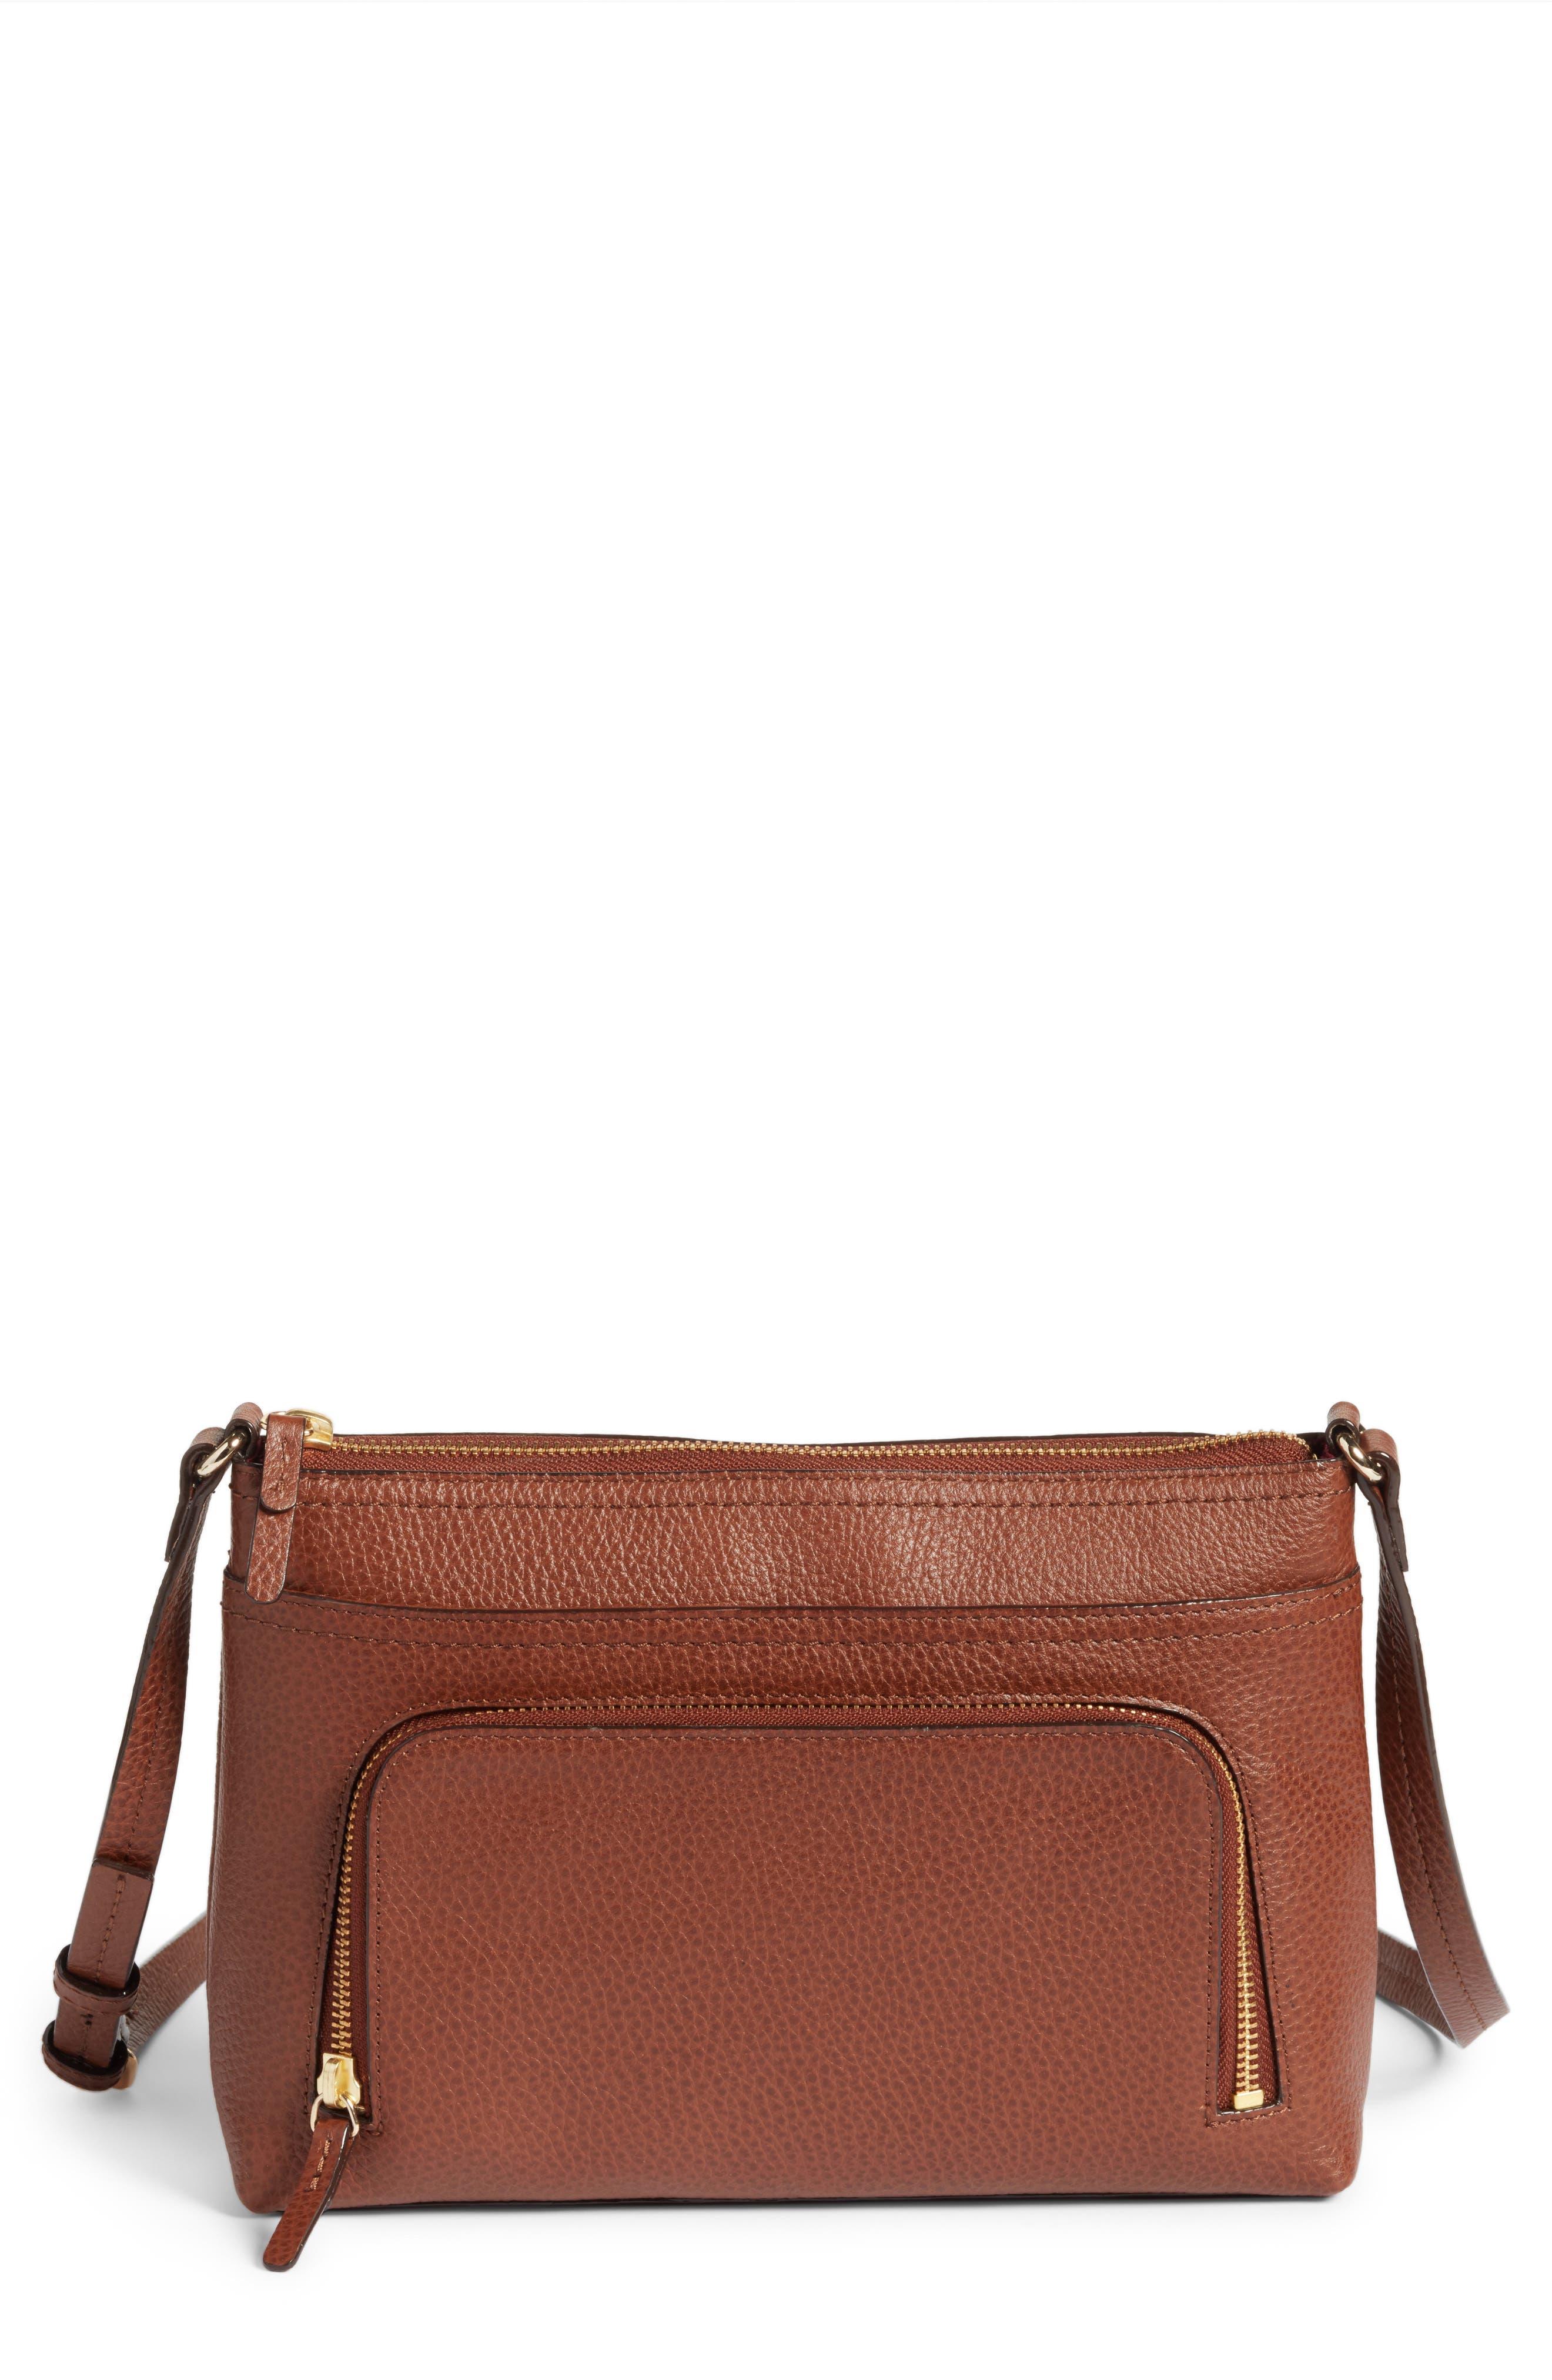 Alternate Image 1 Selected - Nordstrom Pebbled Leather Crossbody Bag